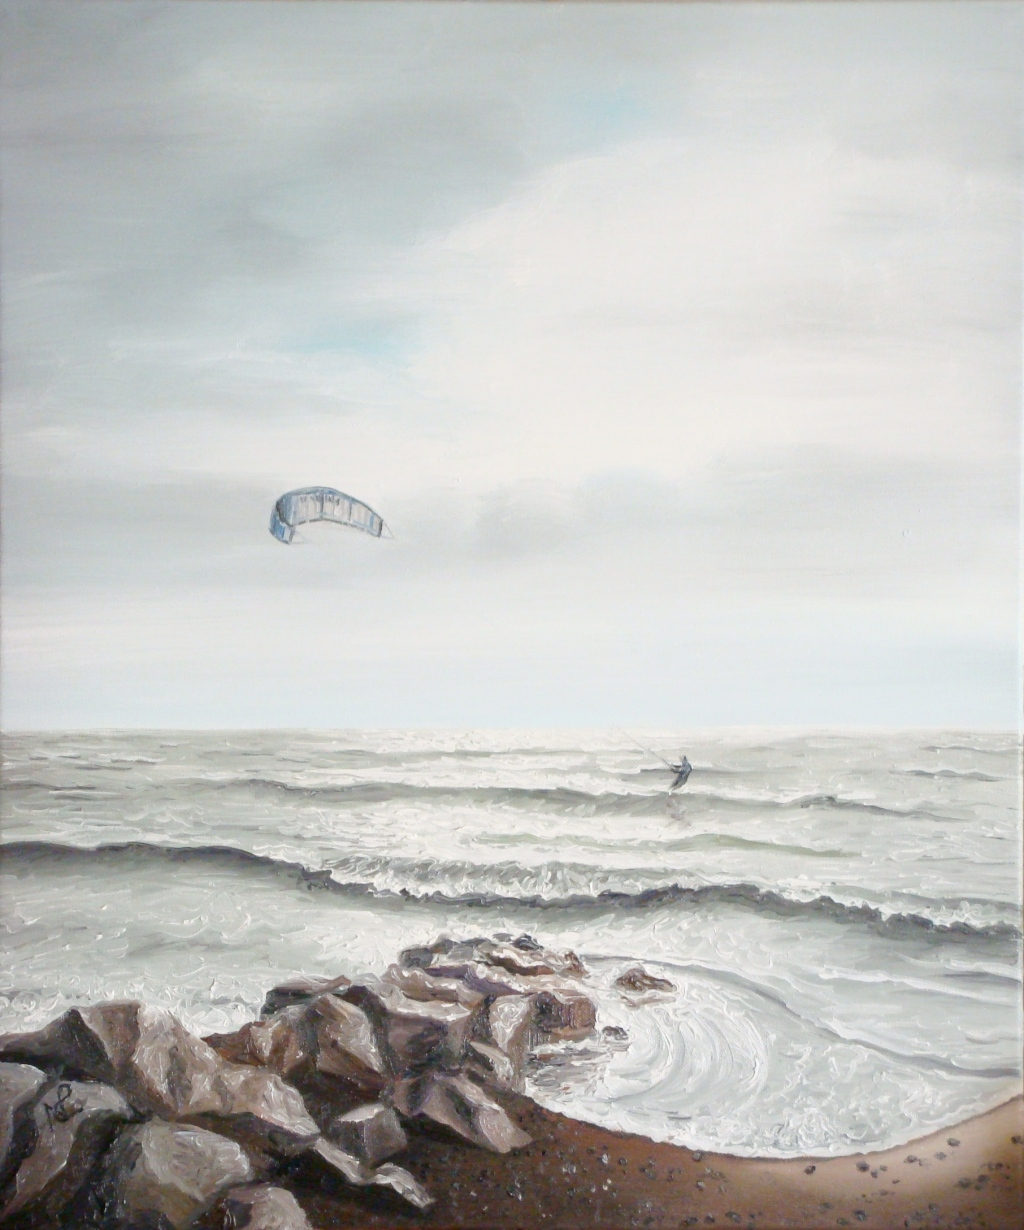 Seascape III: Silver Surfer (2008 © Nicholas de Lacy-Brown, oil on canvas)